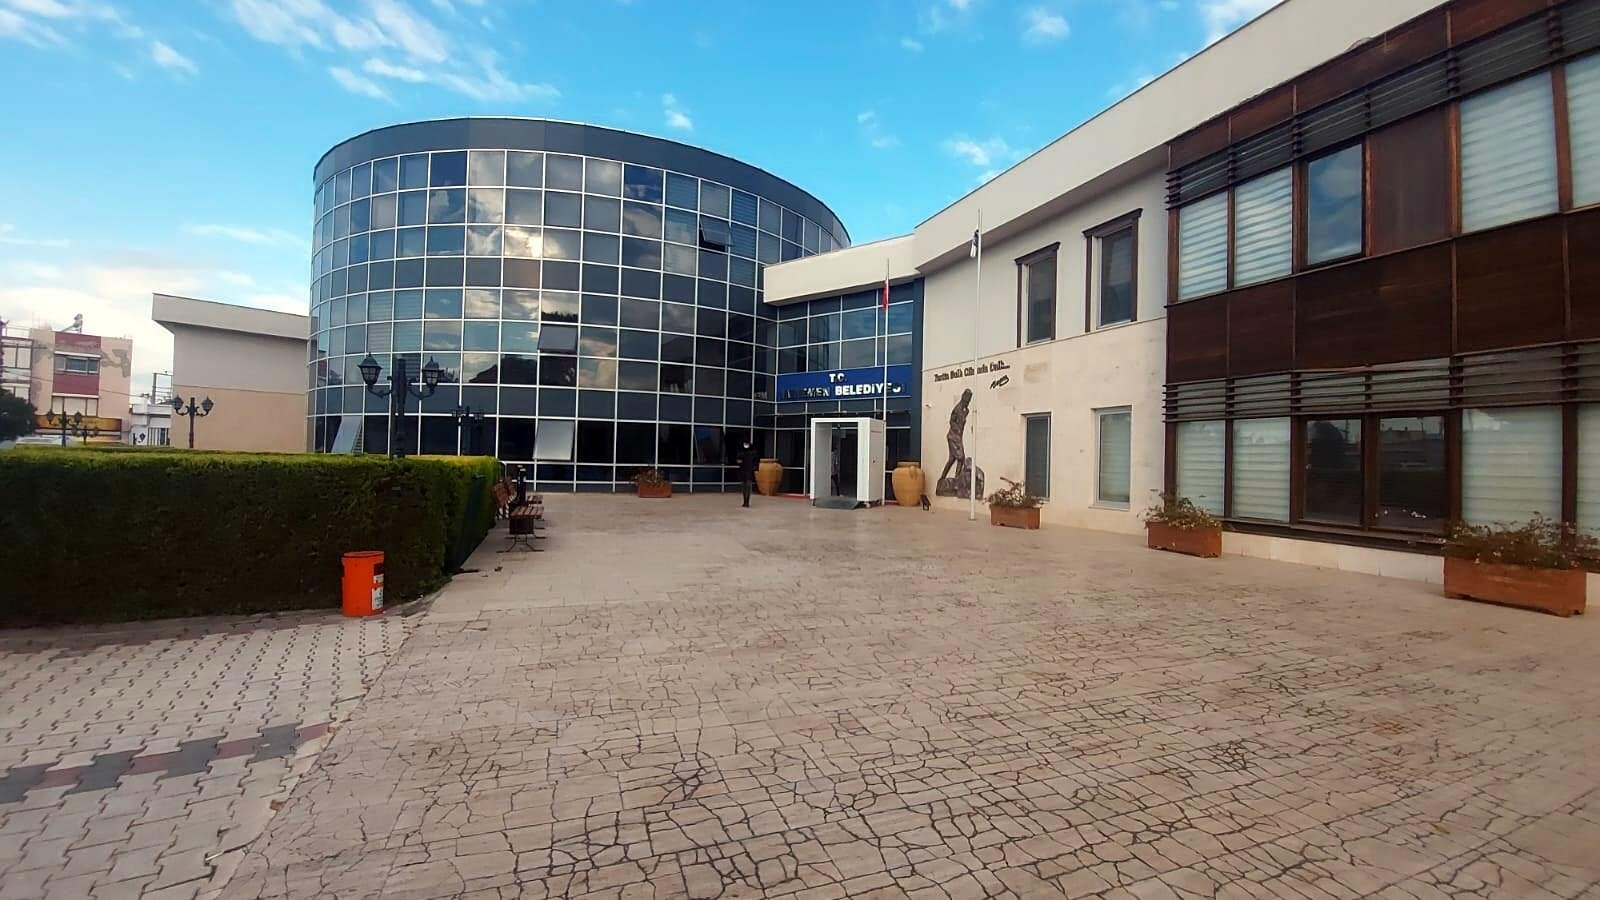 The Menemen Municipality building in Izmir, western Turkey, Nov. 20, 2020. (DHA Photo)